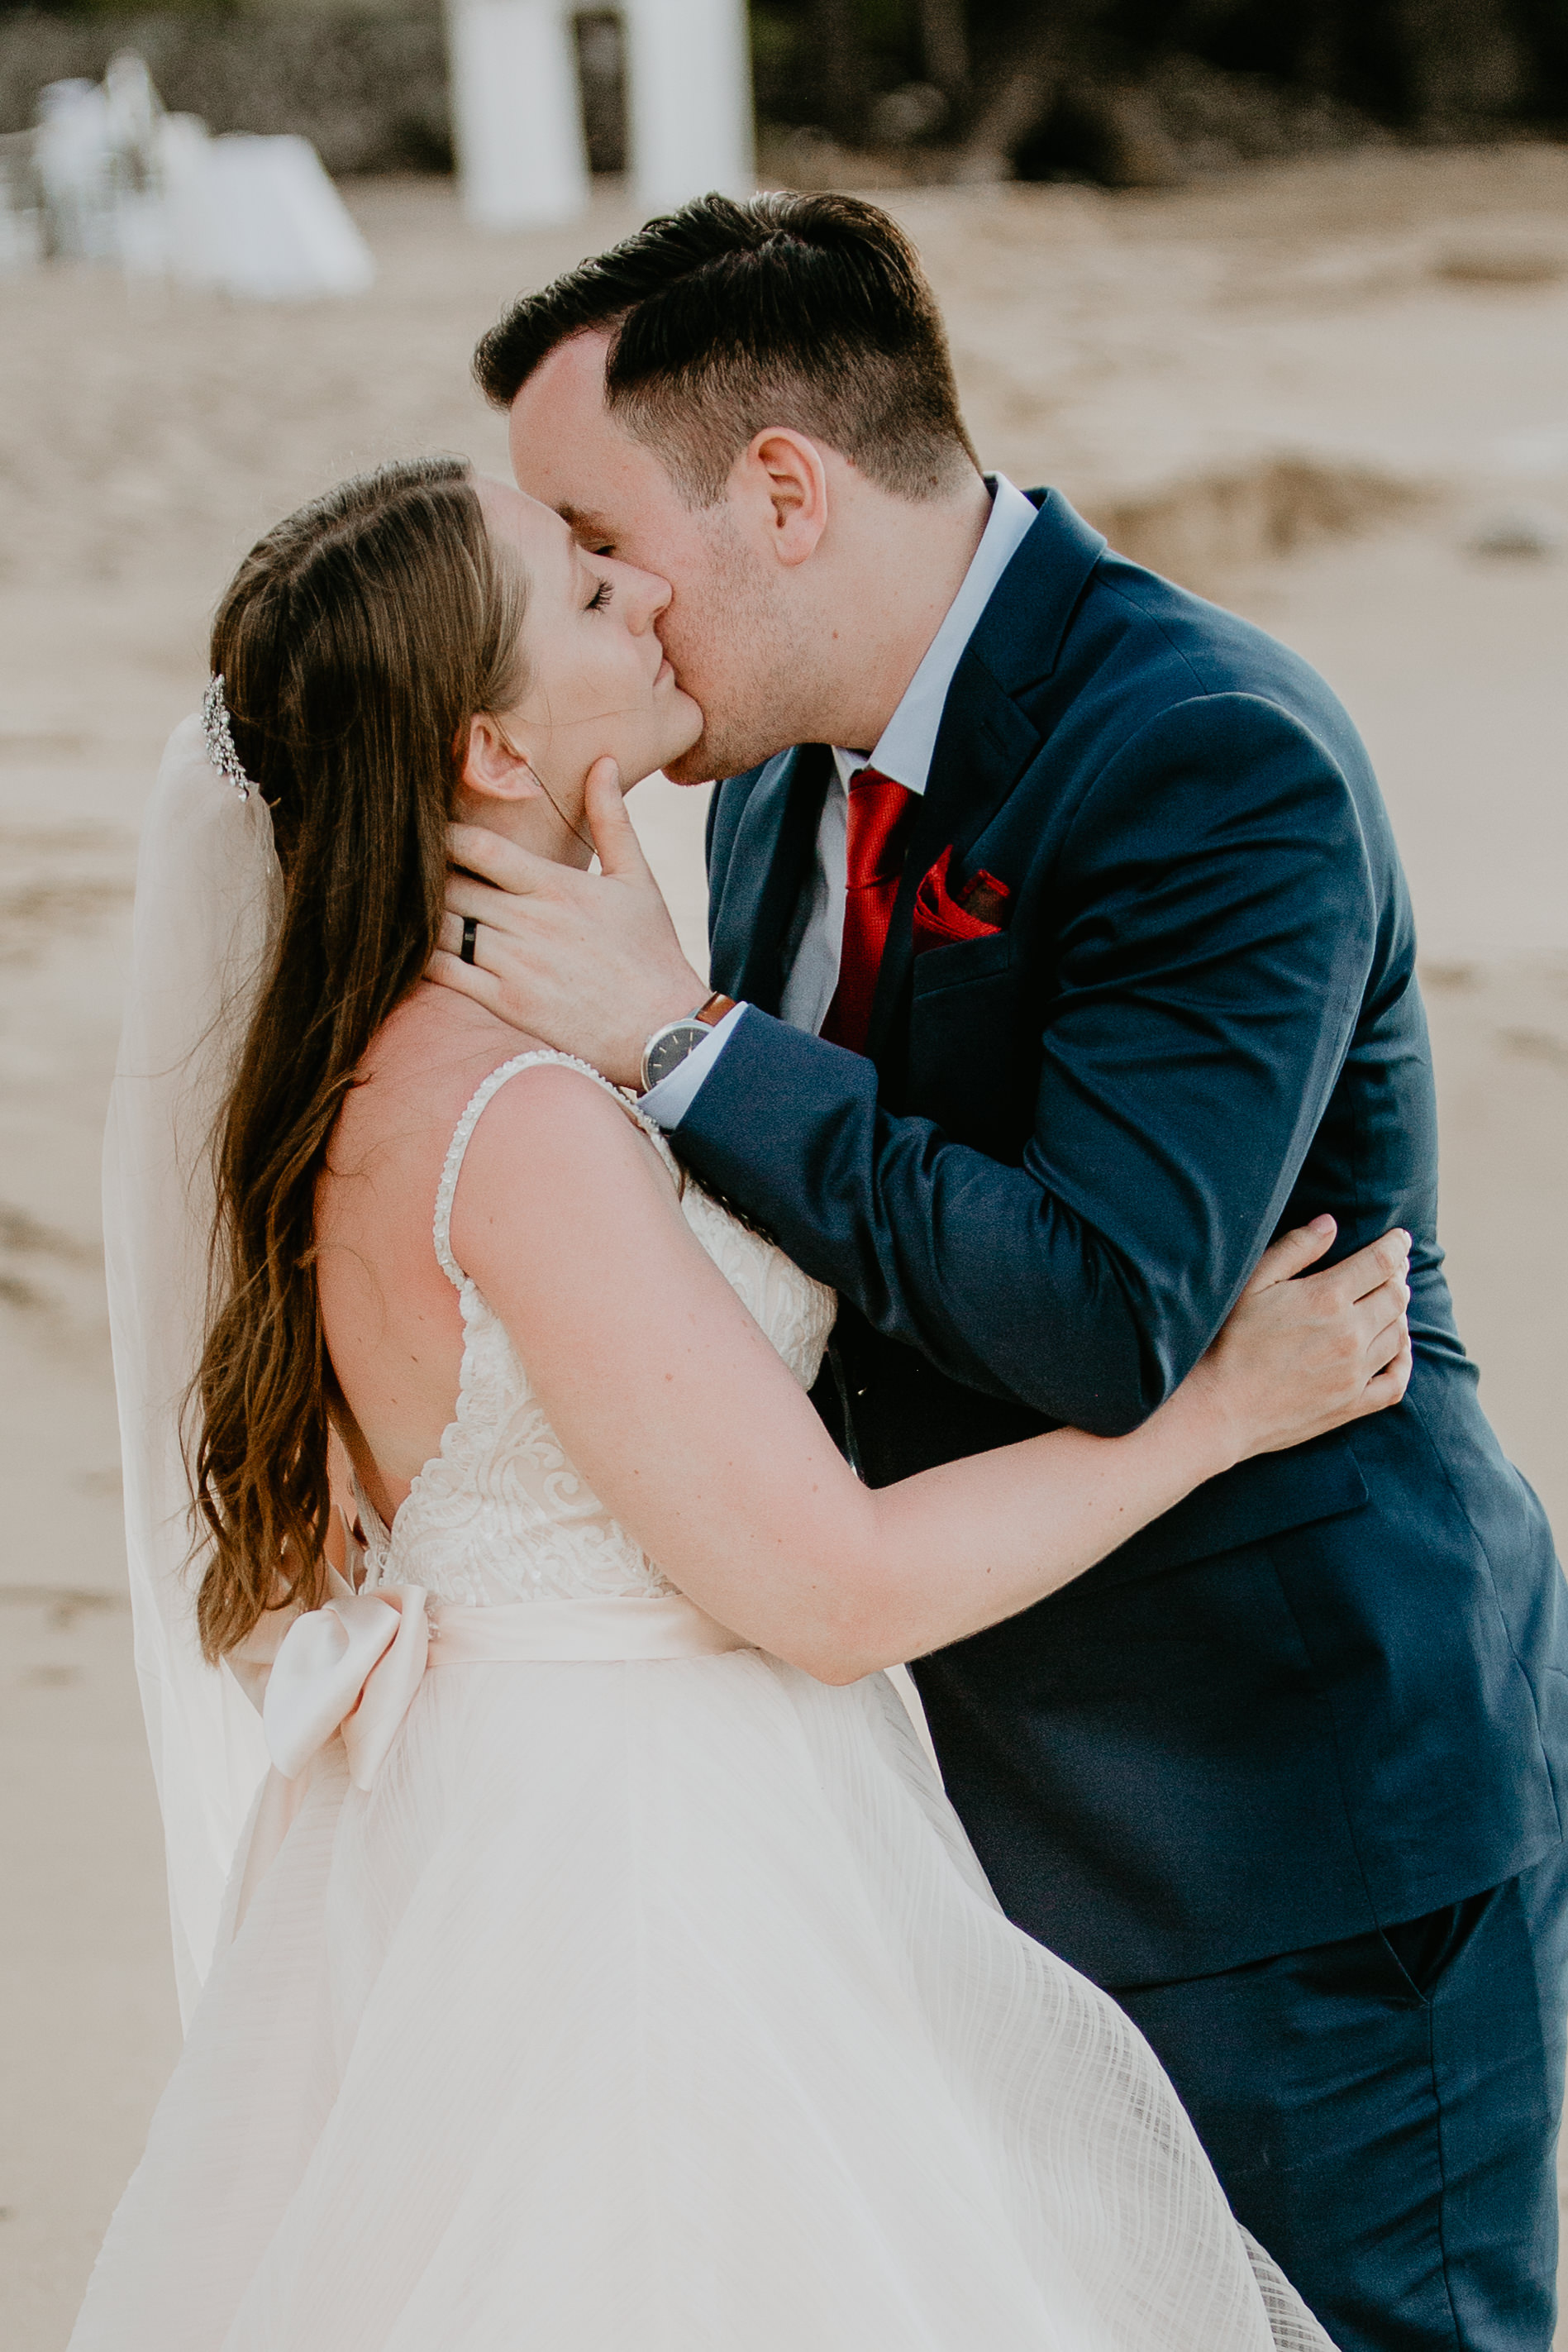 nicole-daacke-photography-destination-wedding-in-st-lucia-sandals-la-toc-intimate-island-wedding-carribean-elopement-photographer-chill-island-wedding-91.jpg